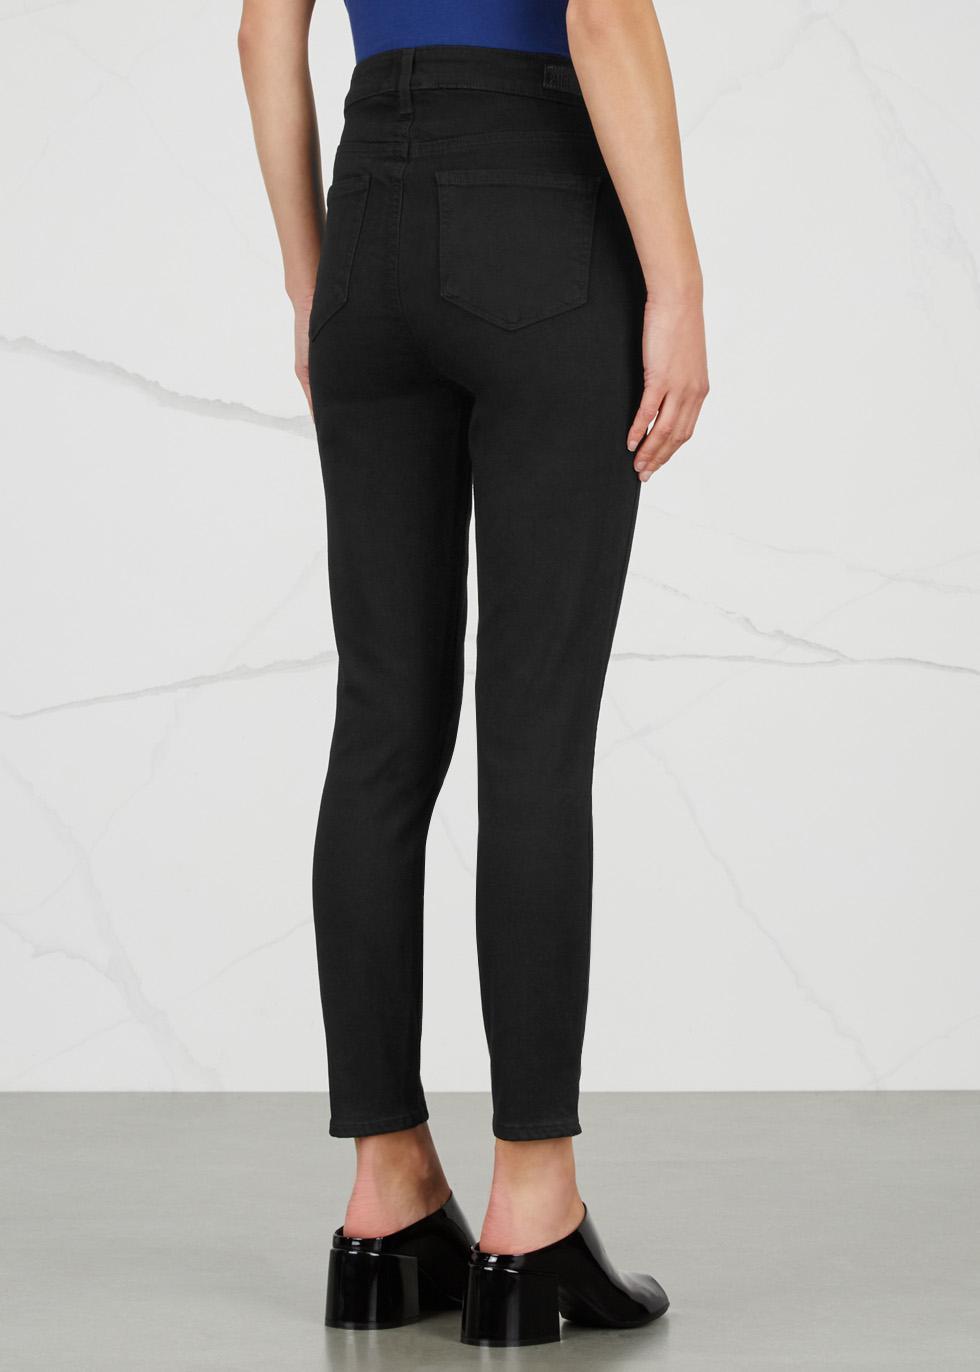 Margot Transcend cropped skinny jeans - Paige